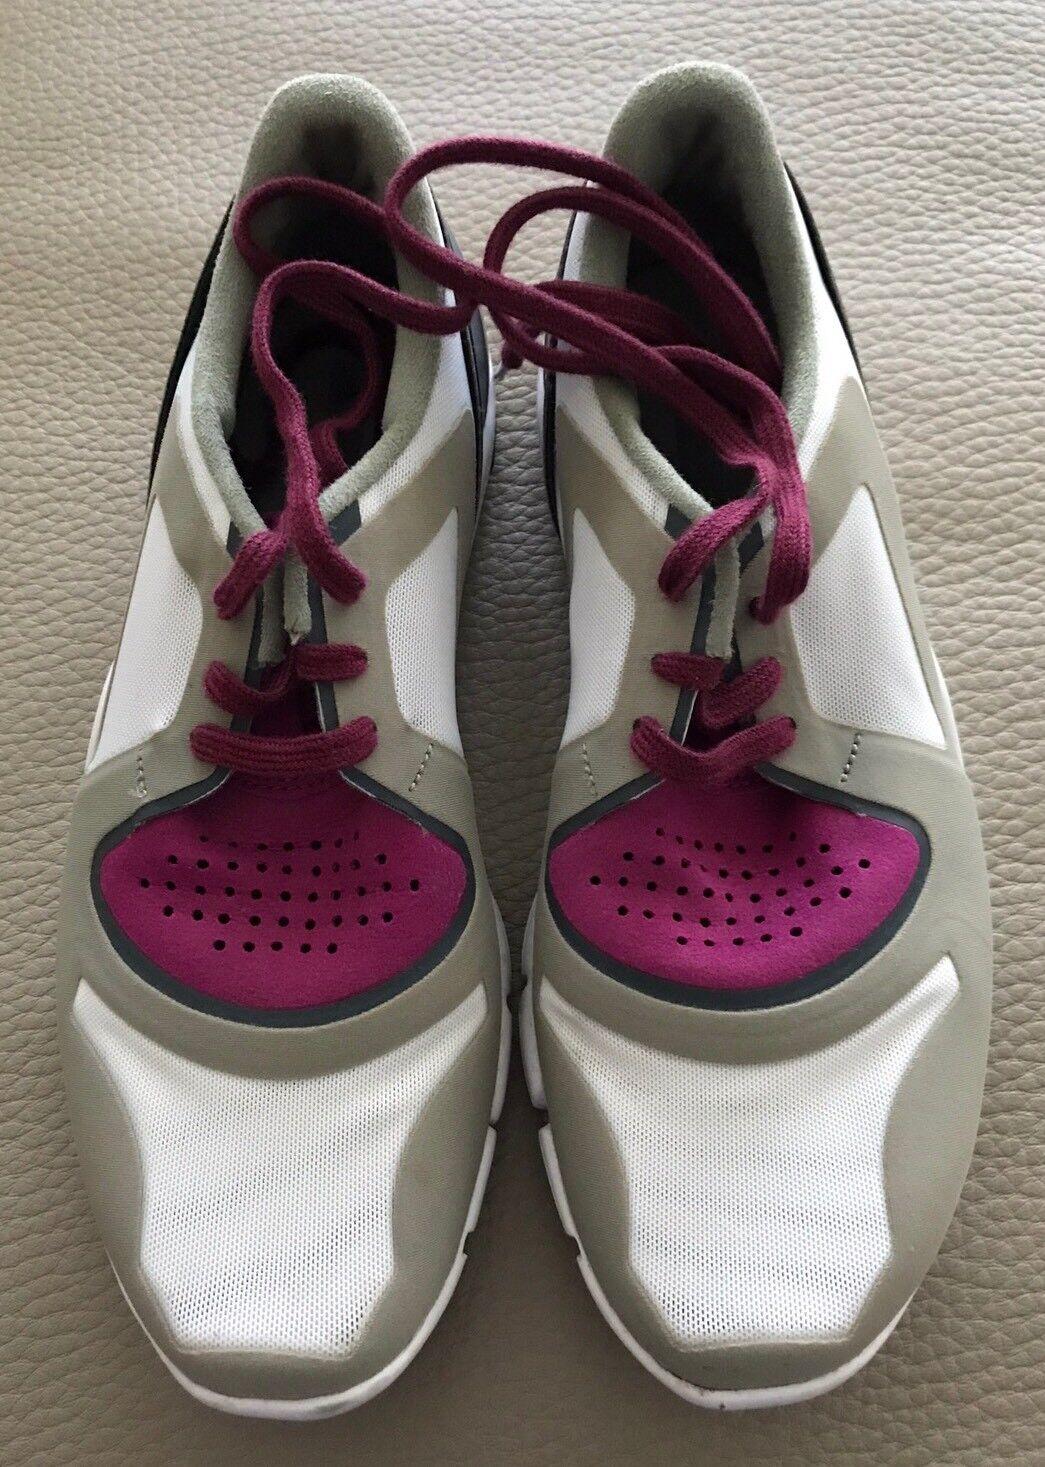 hot sales a4b1b 55550 adidas stella mccartney women shoes Size Size Size US 8.5 Retail  195 Plus  tax 25516a